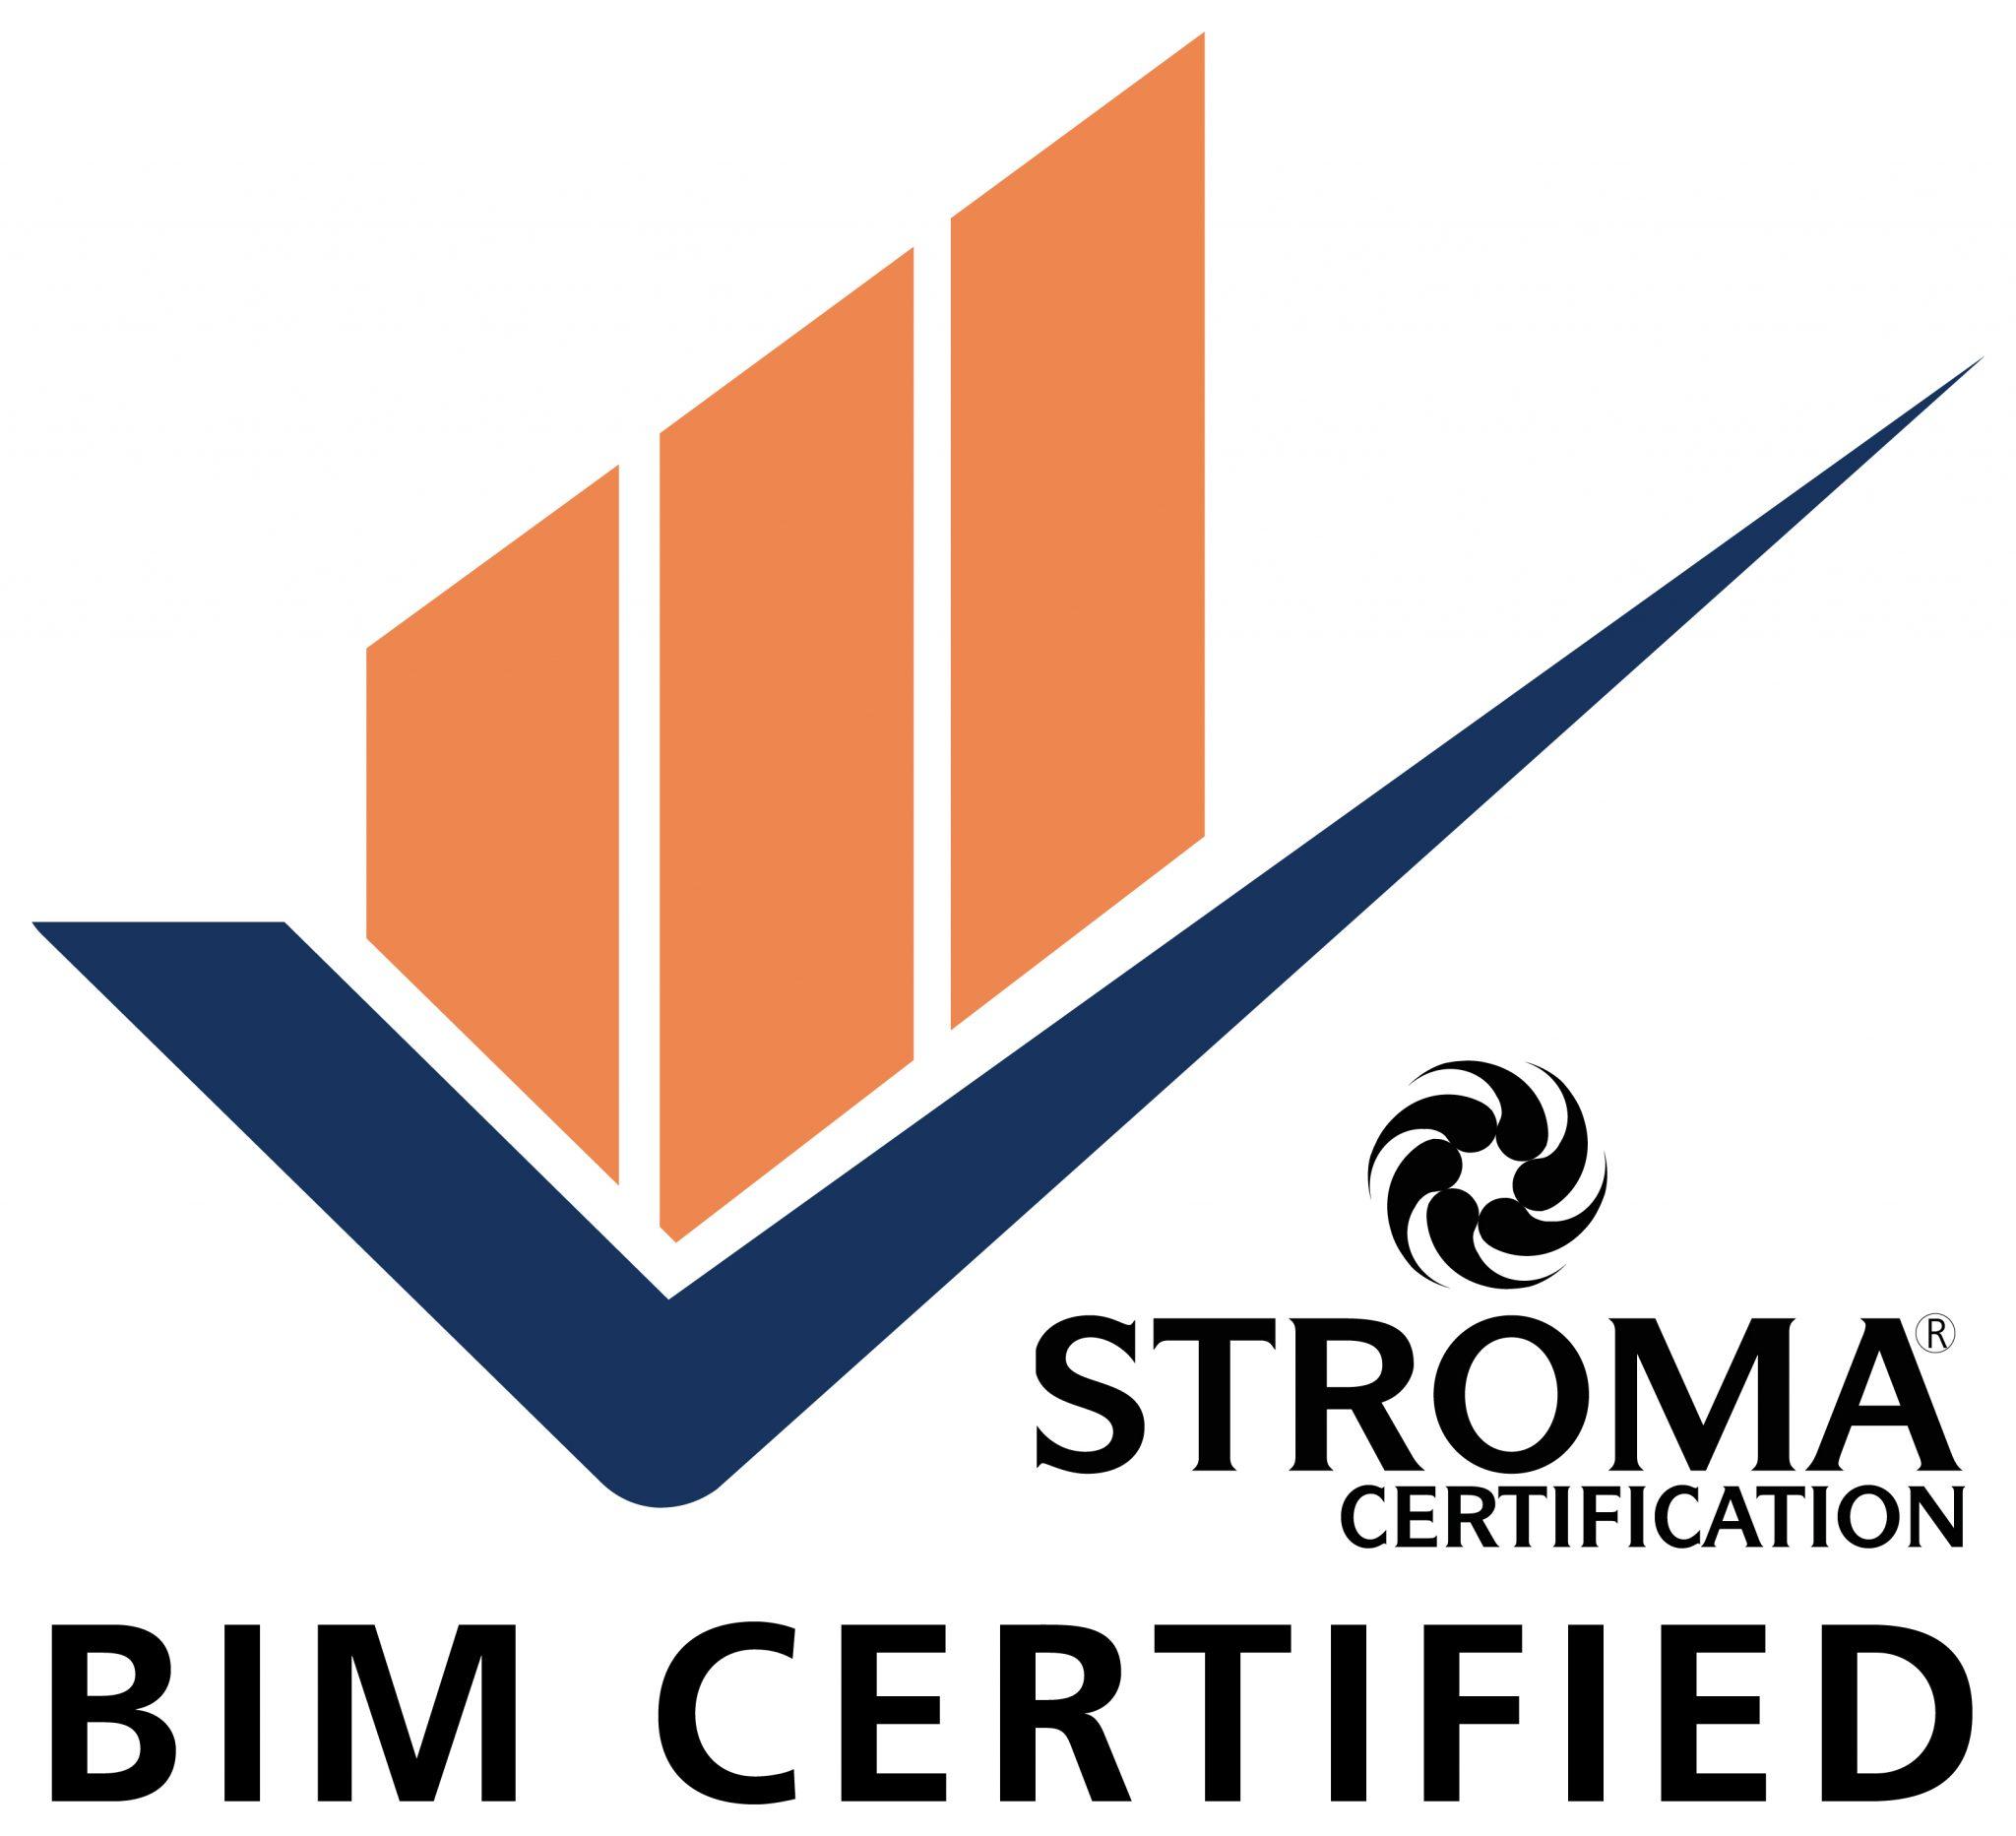 BIM Certified PAS 1192-2:2013